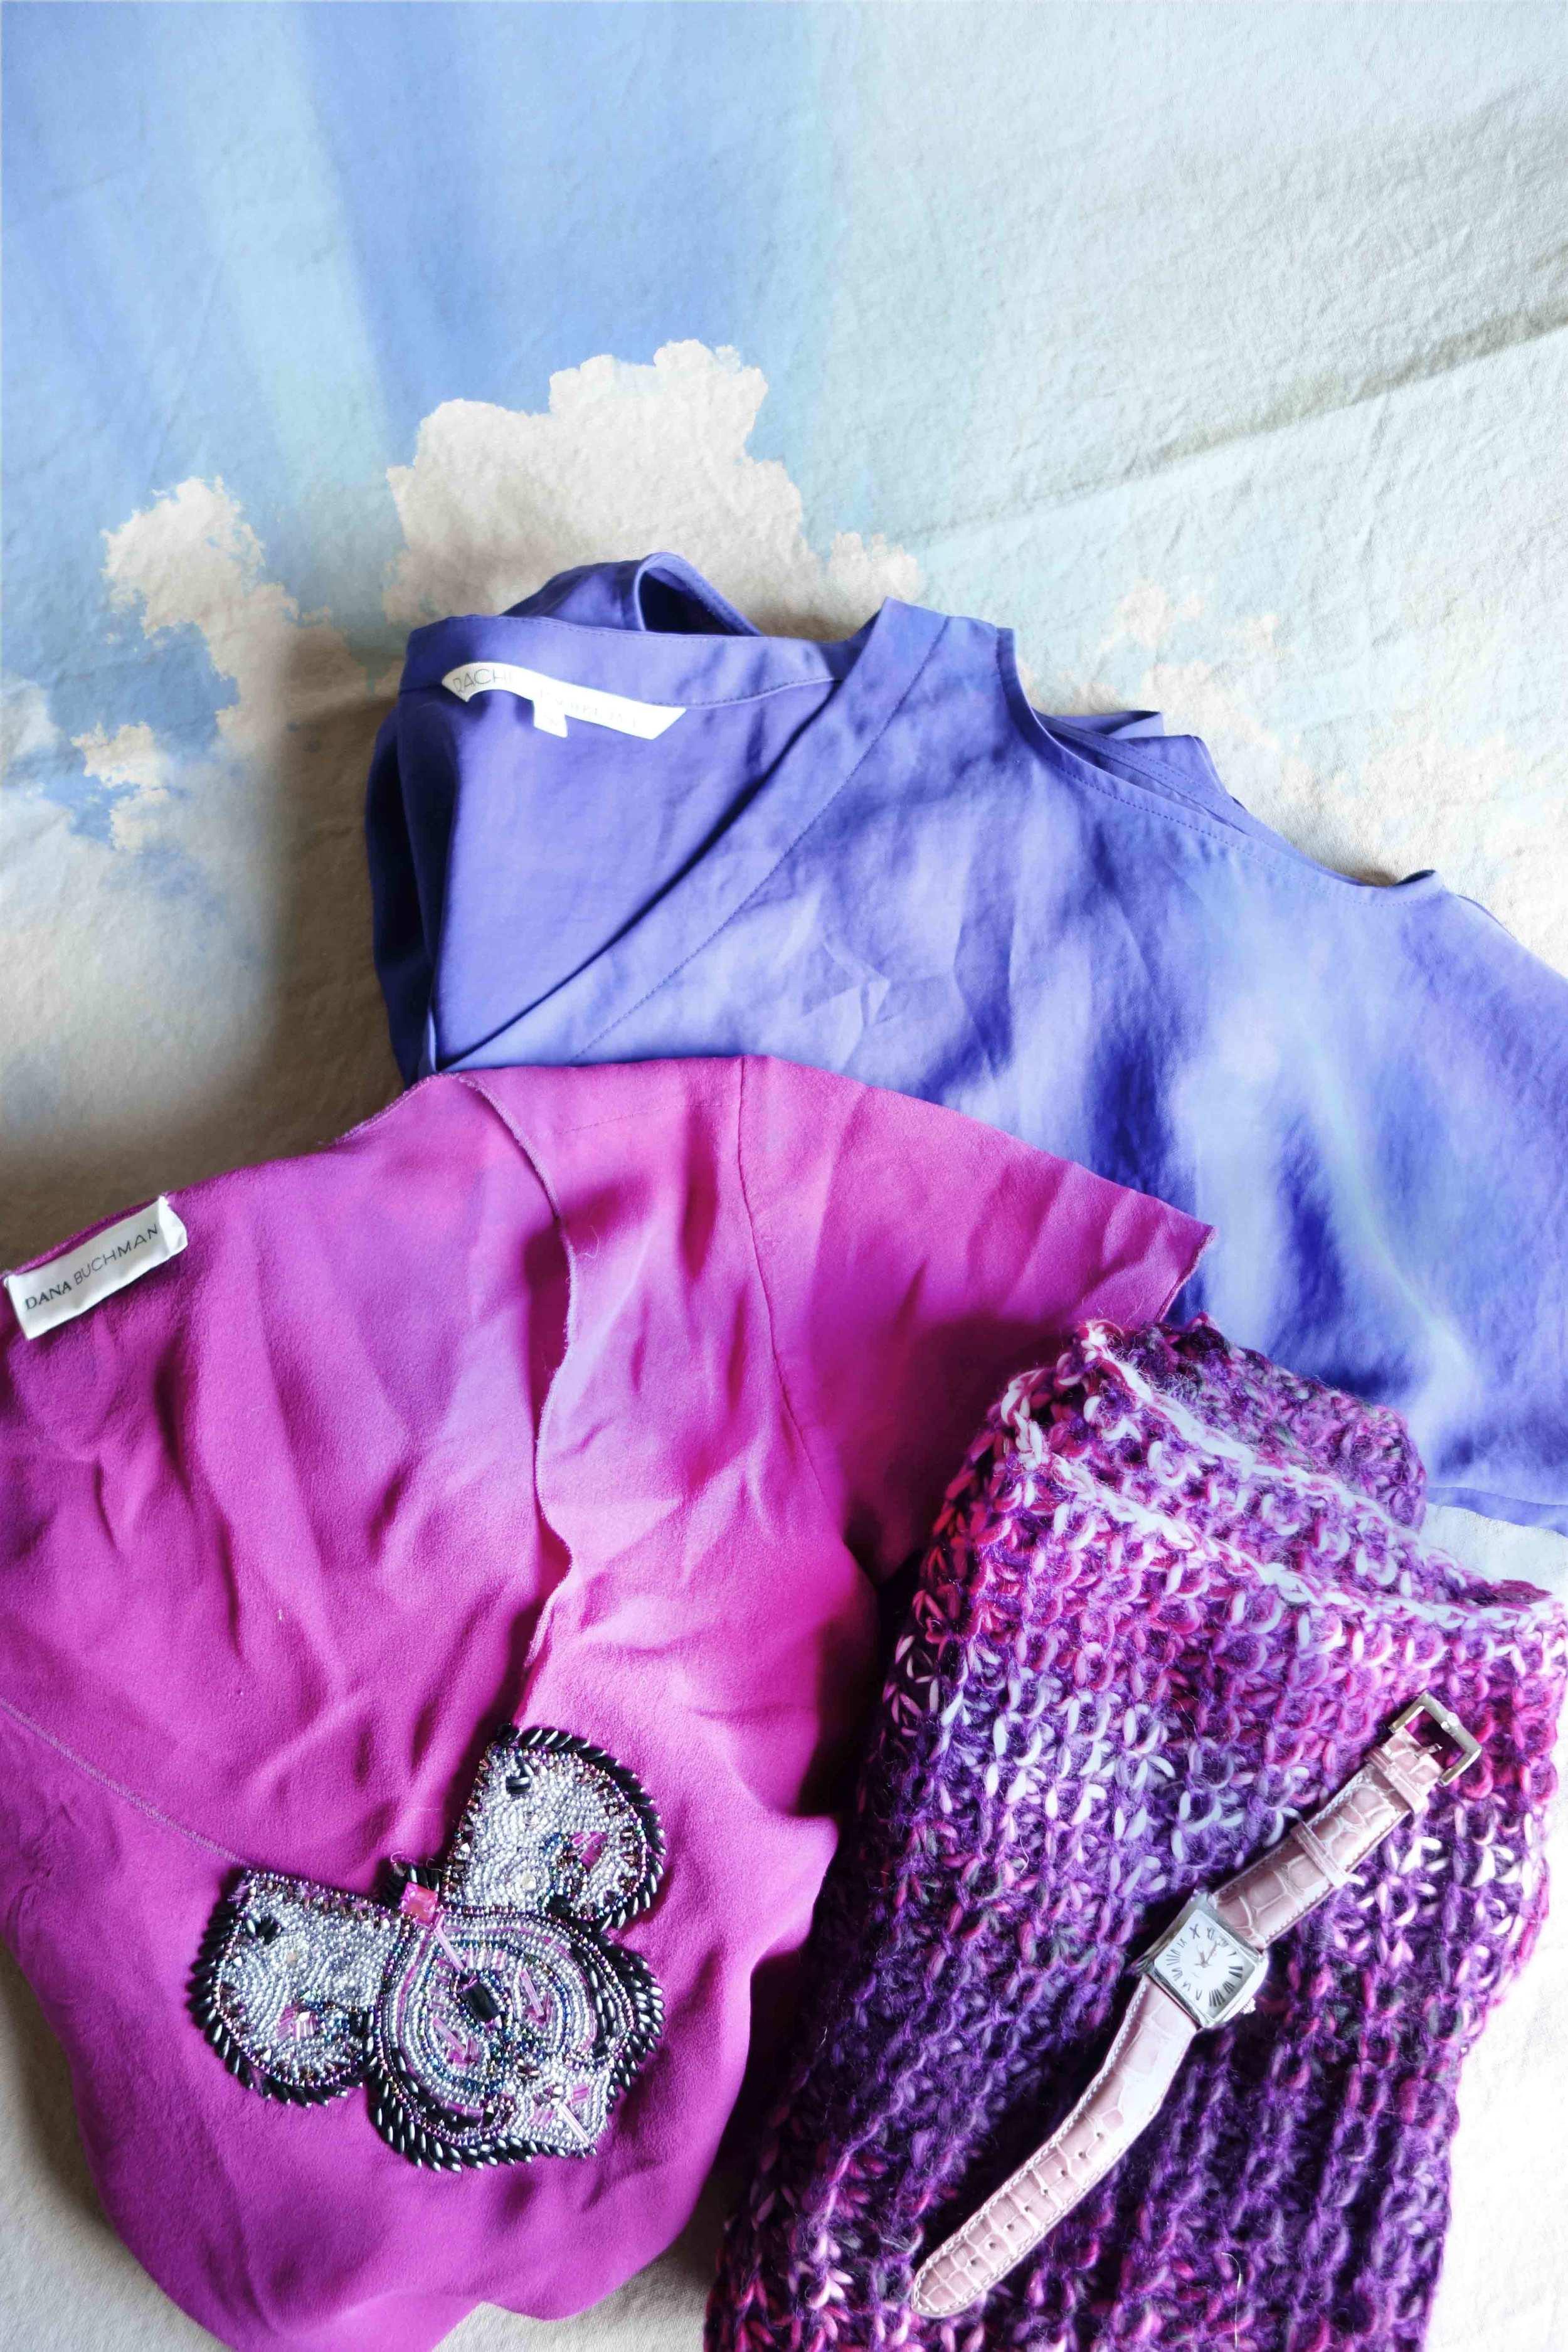 clouds + sunbleach silk:   hand-me-down Dana Buchman blouse +  Rachel Zoe  + gifted infinity knit + wrist watch